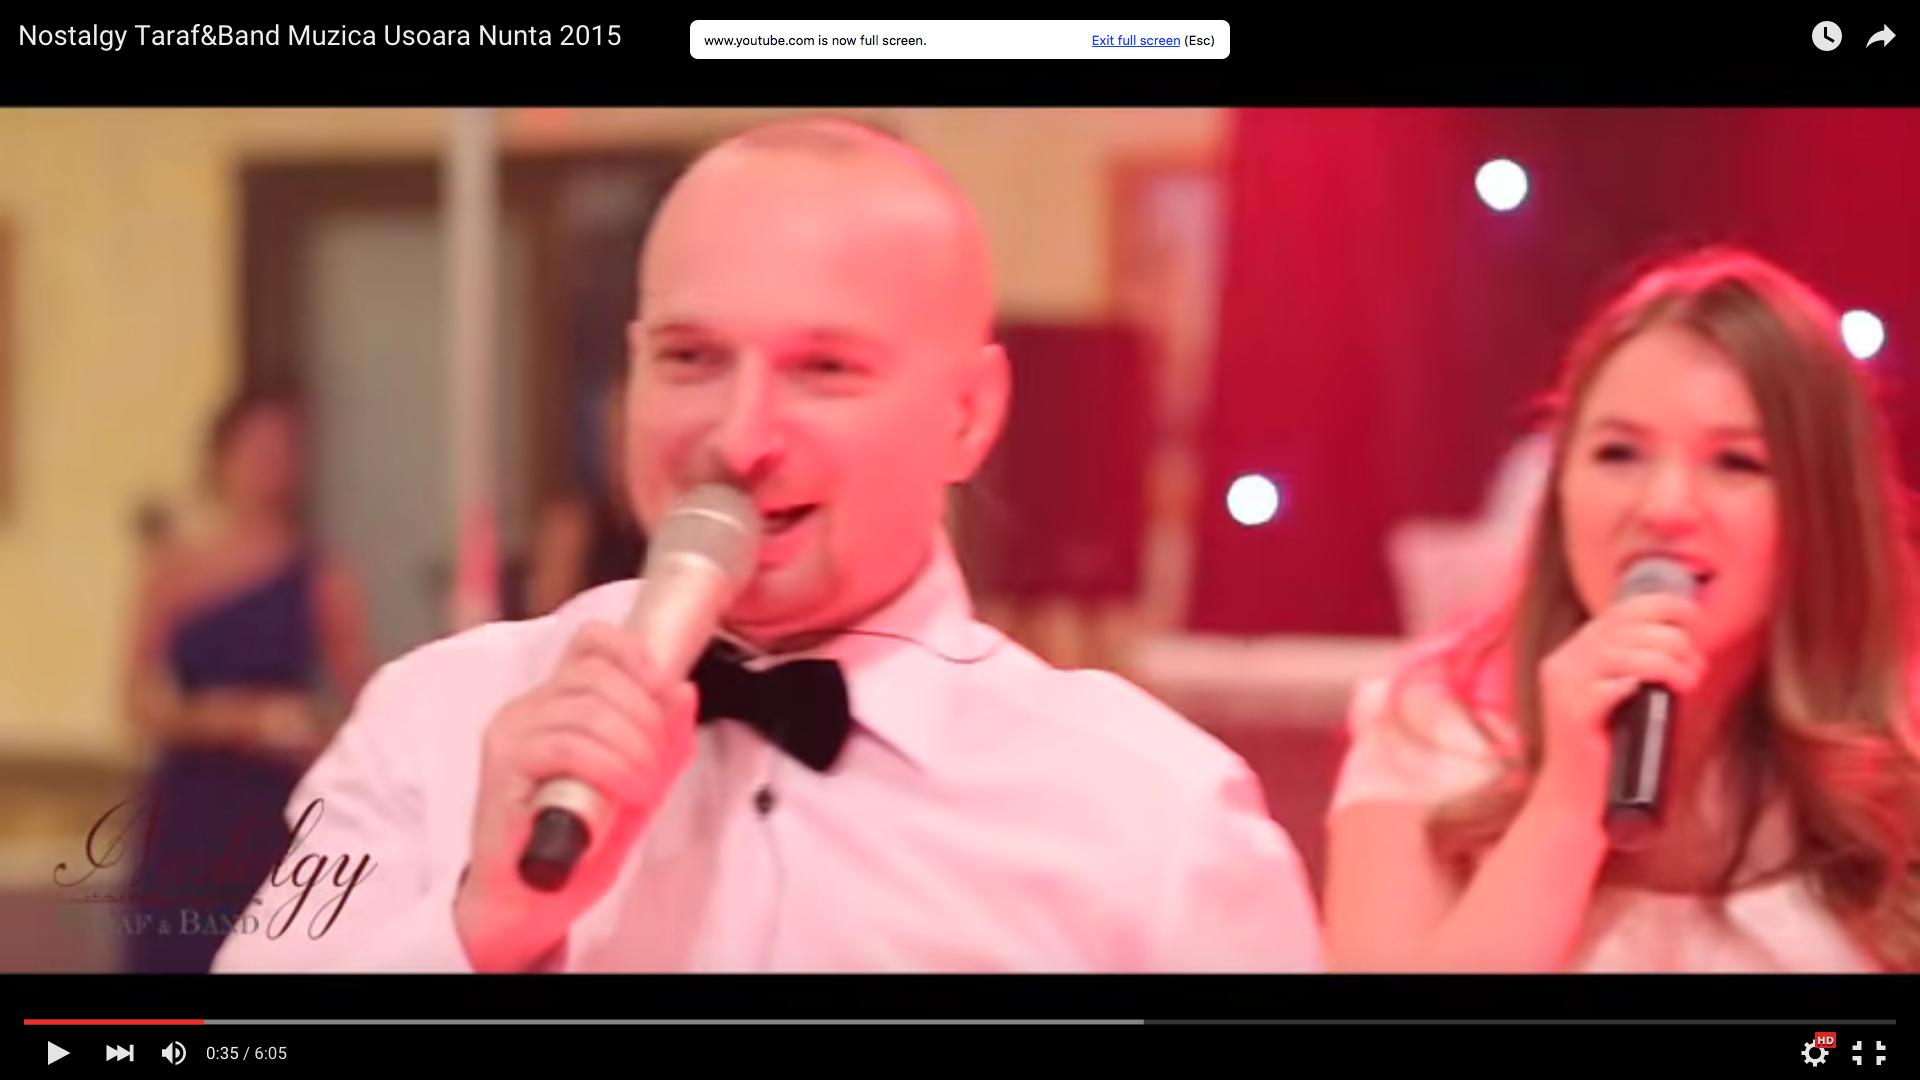 formatie nunta Nostalgy Taraf&Band Muzica Usoara Nunta 2015